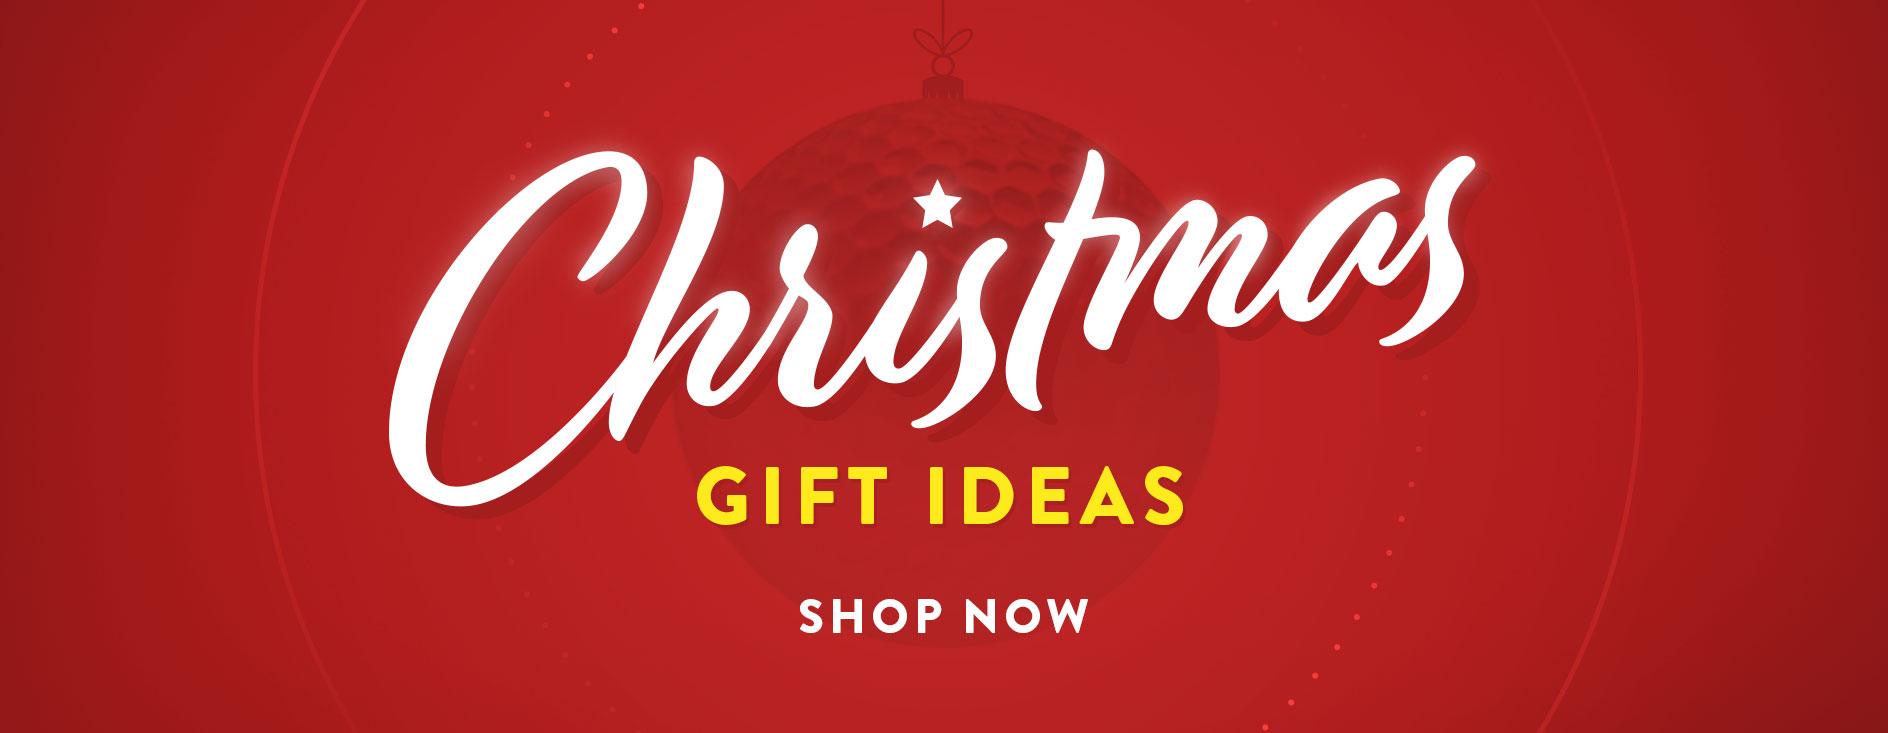 xmas-gift-ideas-2020.jpg